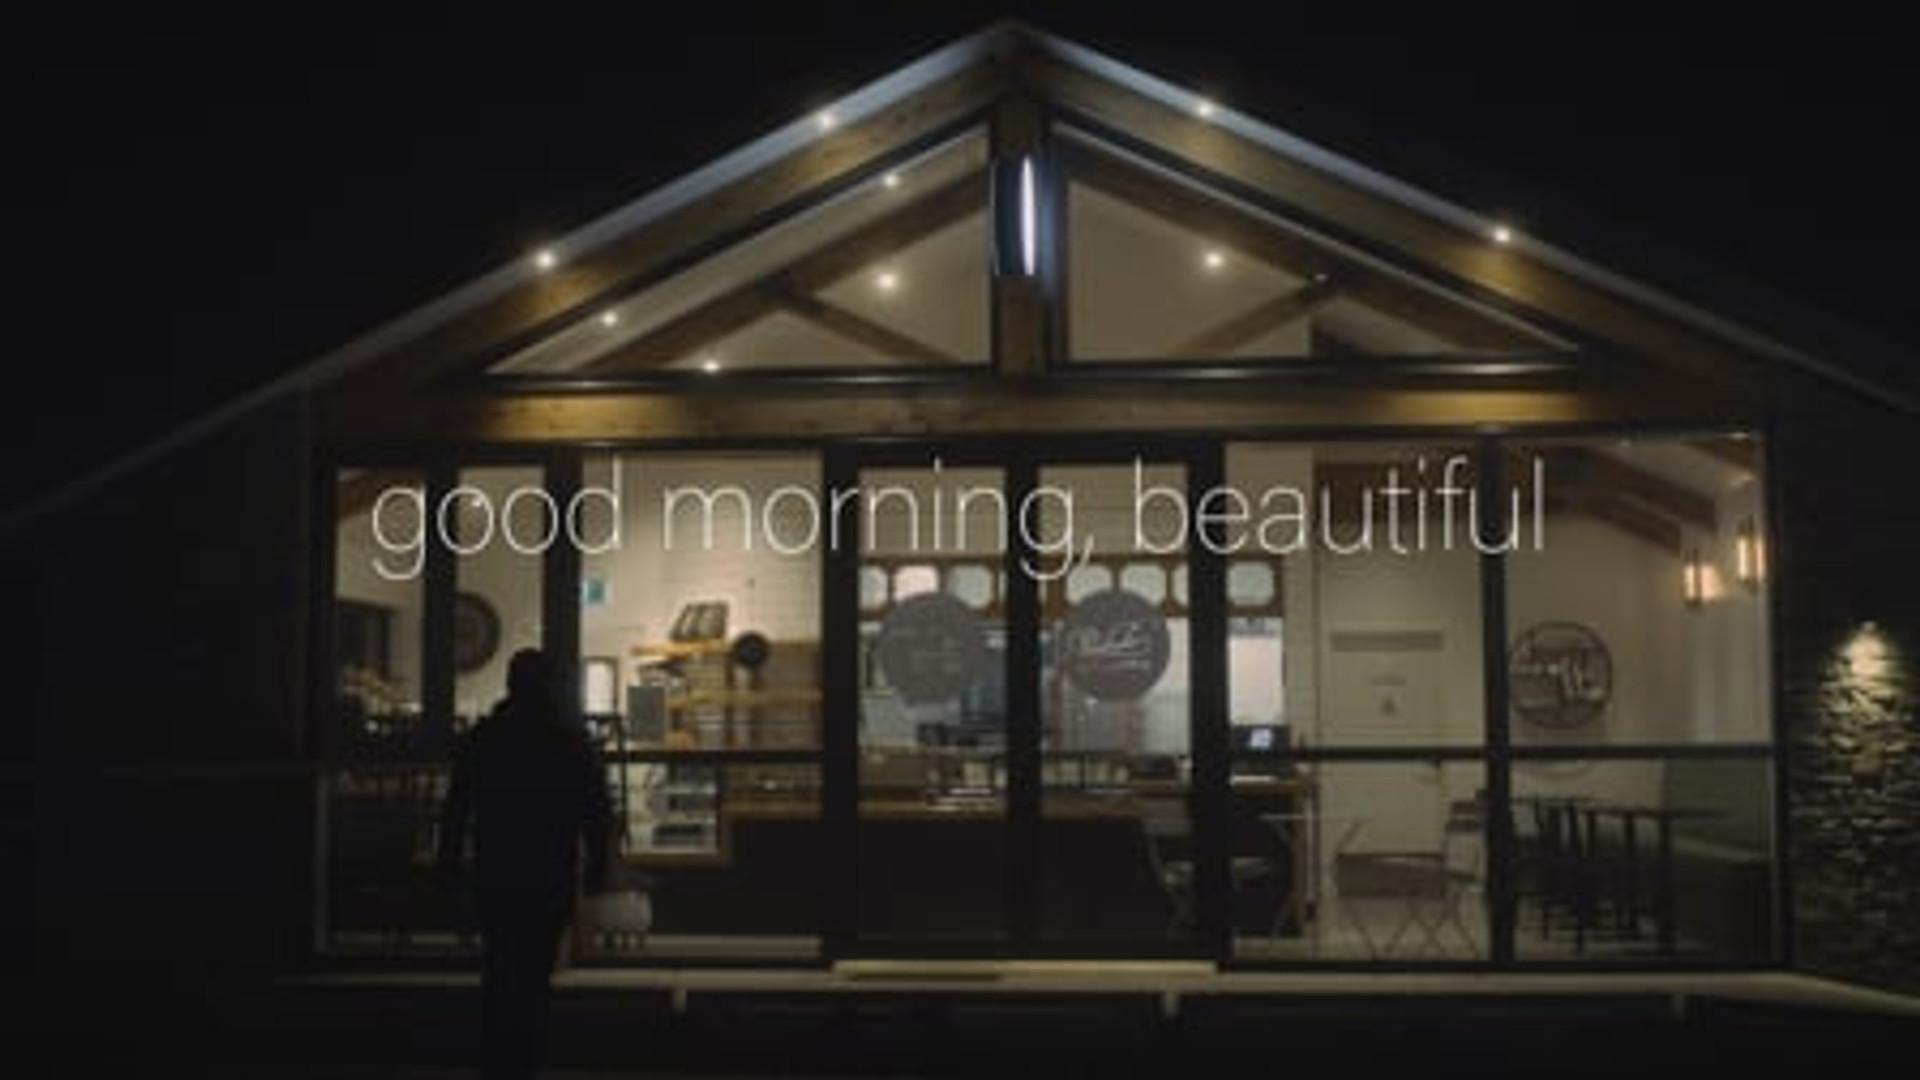 Good morning beautiful by The Film Crew Ltd